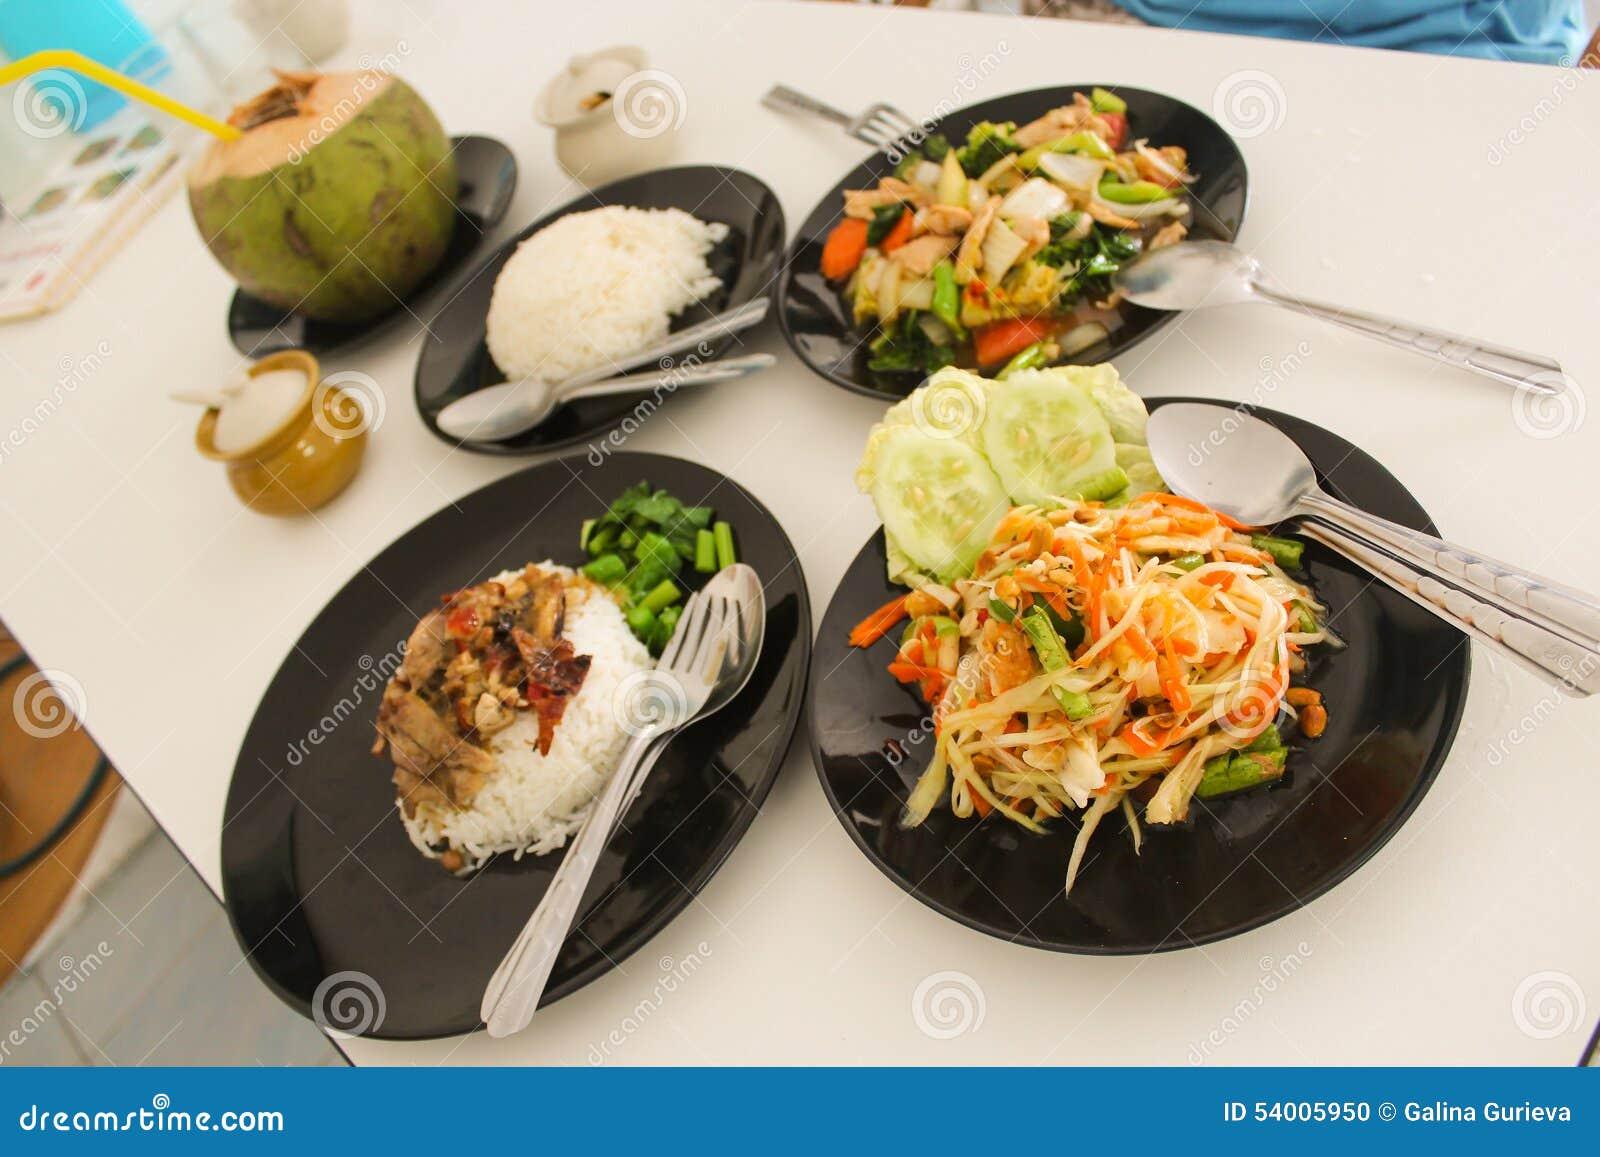 Thai Food Stock Photo Image Of Rice Sauce Dish Eating 54005950